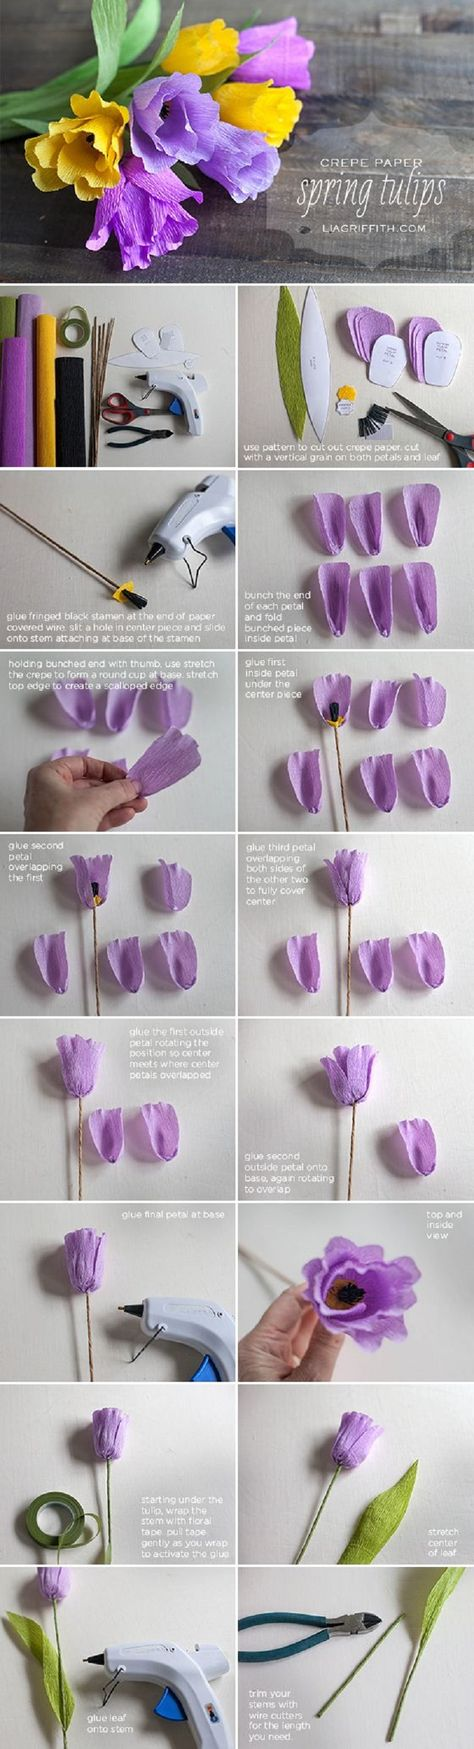 DIY Crepe Paper Tulips - 17 Blossoming DIY Spring Decorating Tutorials | GleamItUp